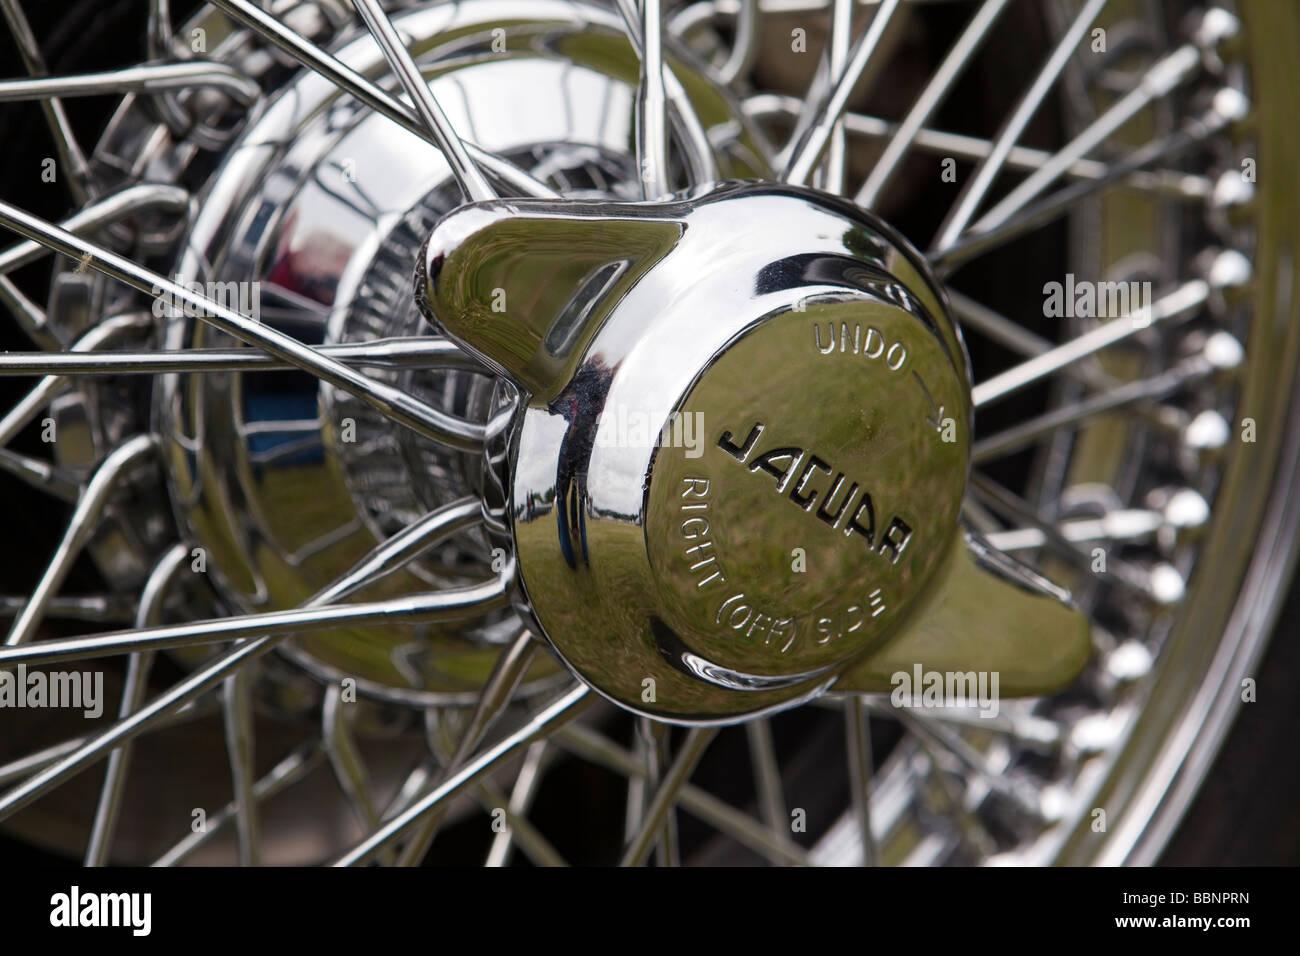 jaguar xk140 stock photos jaguar xk140 stock images alamy motoring chromed wheel spinner on wire wheel of classic 1950s jaguar xk140 sports car stock